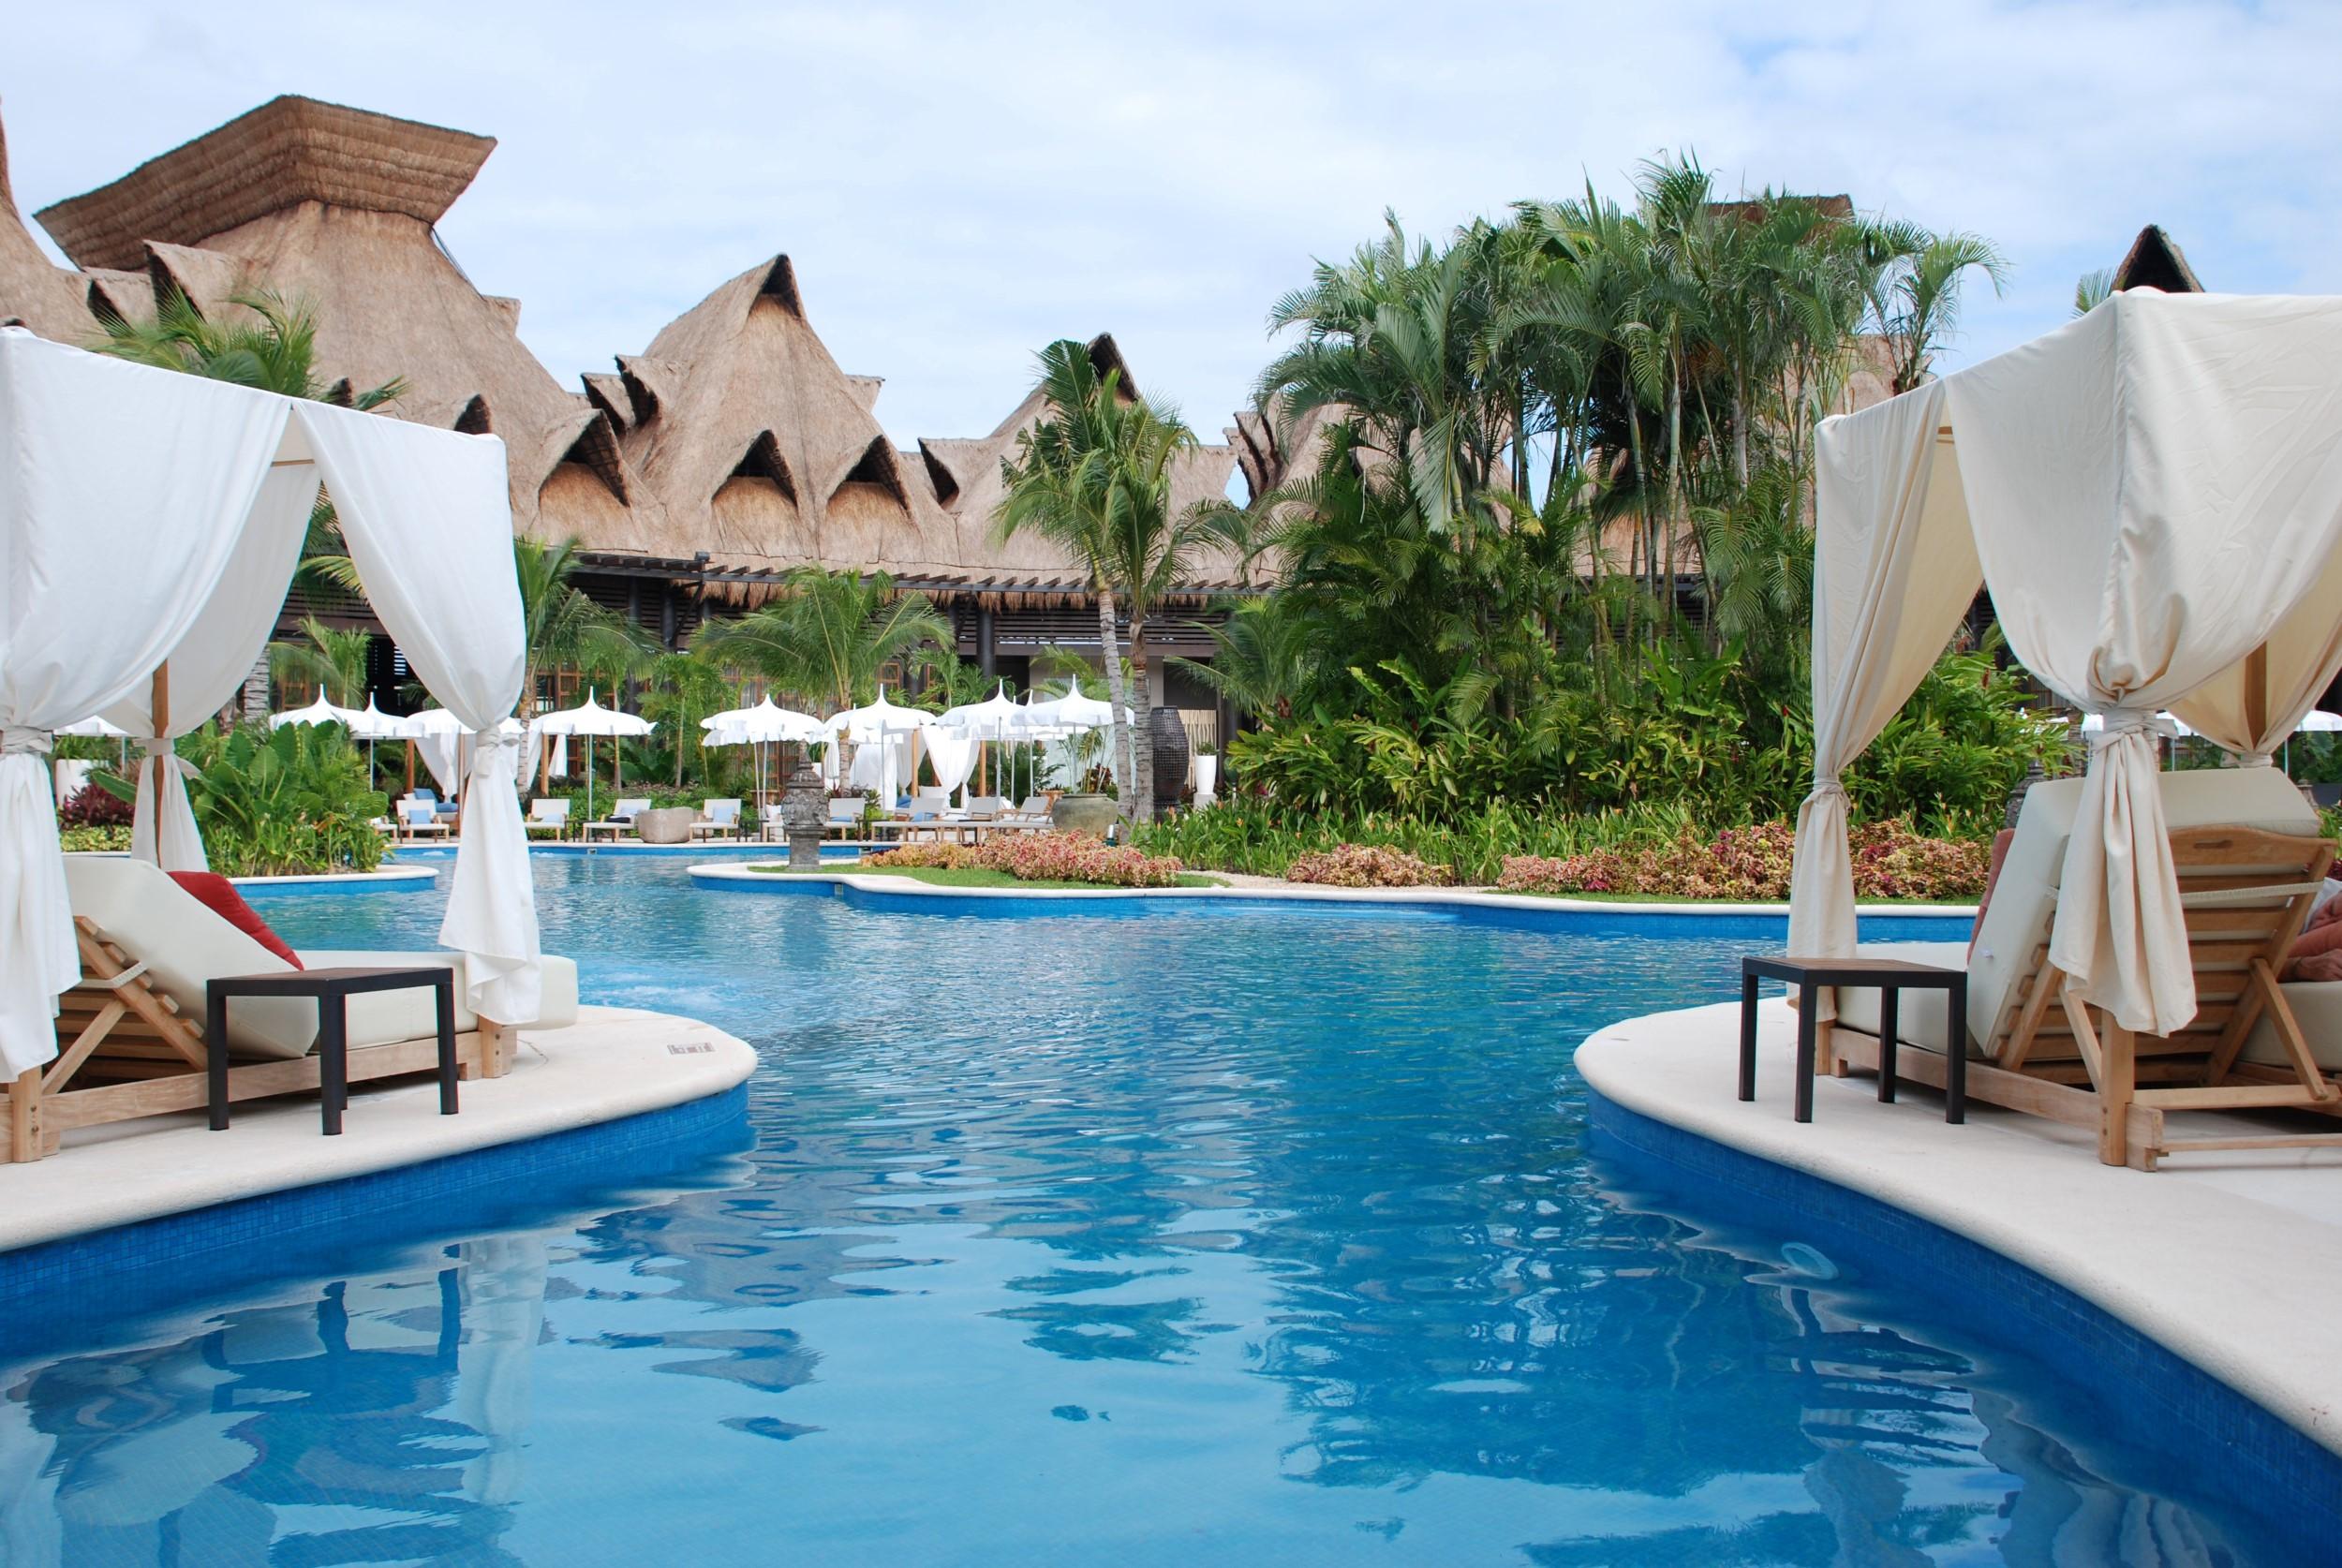 grand bliss riviera maya photos mayan rental blog. Black Bedroom Furniture Sets. Home Design Ideas